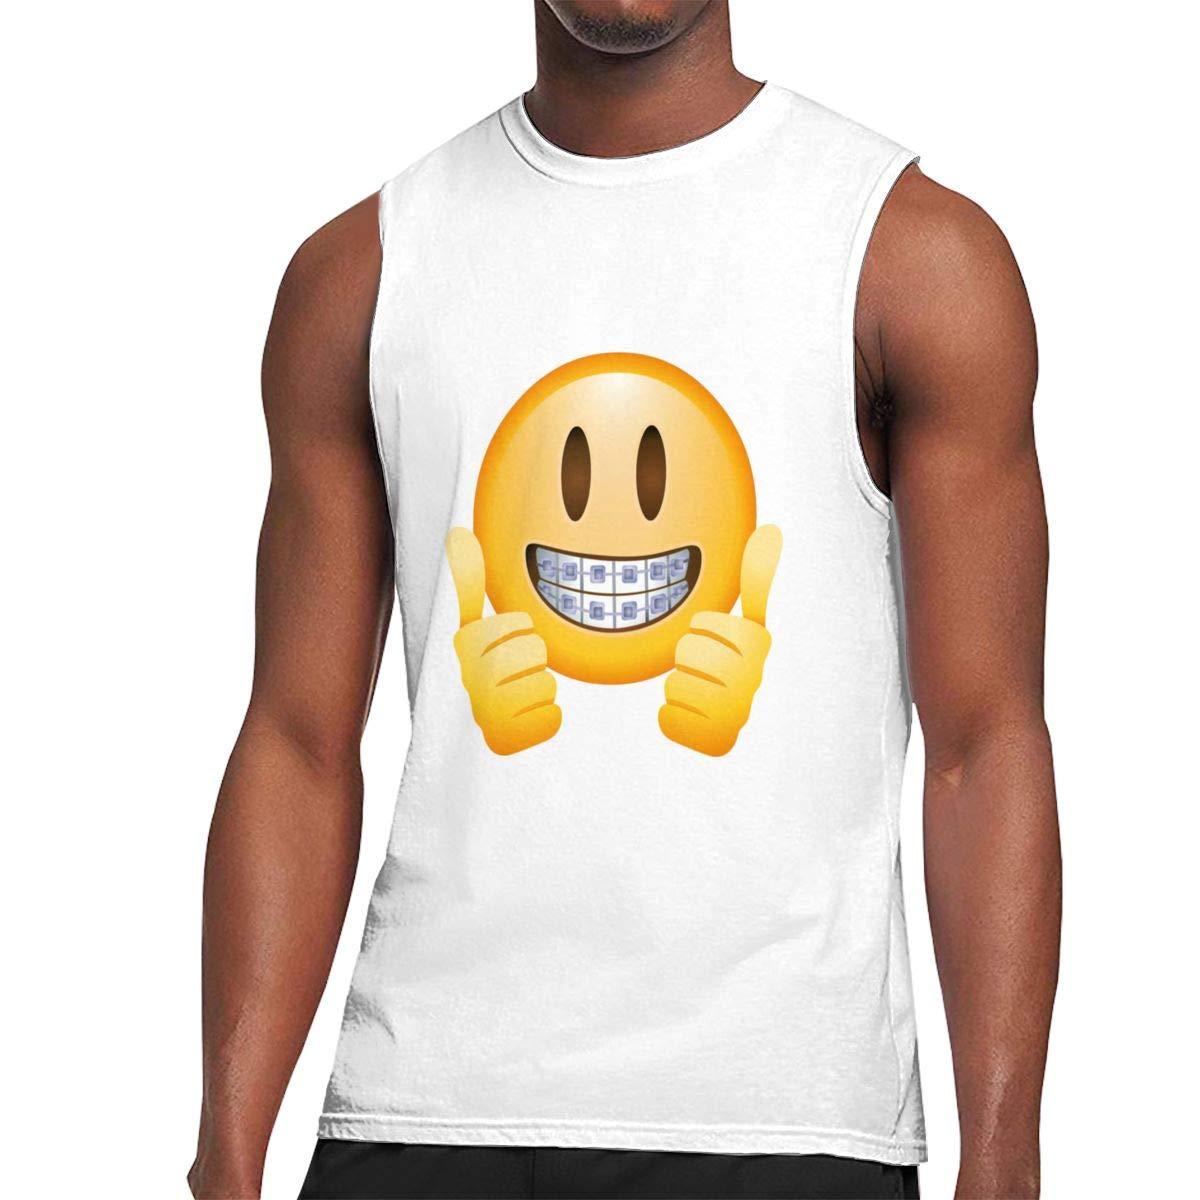 Seuriamin Thumbs Up Emoji Ultra Soft Tennis Sleeveless Muscle Short Sleeve Ts Shirts